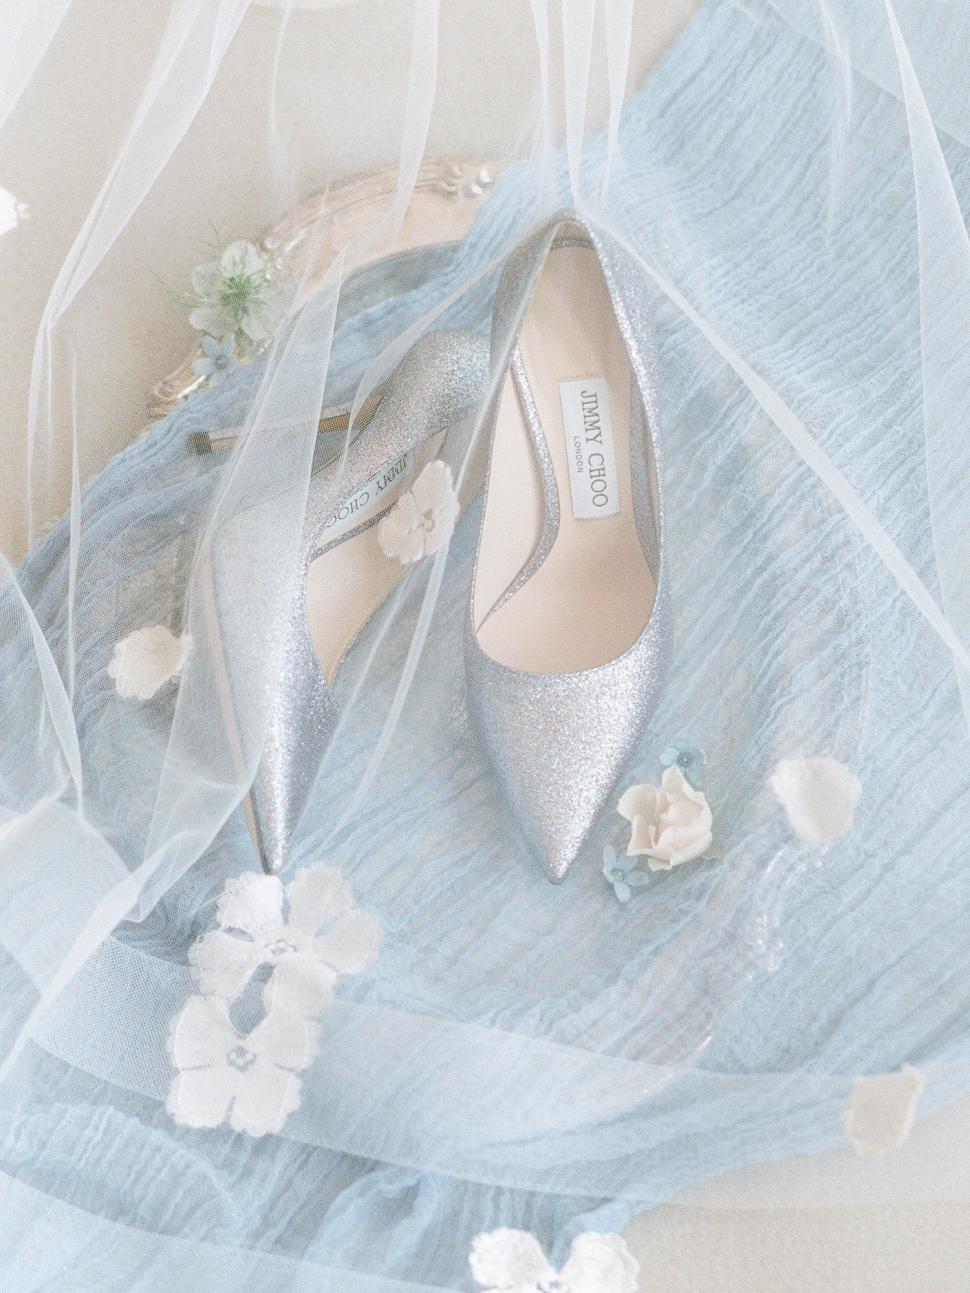 Bourne-Mansion-Wedding-Photos-Cassi-Claire-Long-Island-Wedding-Photographer_06.jpg